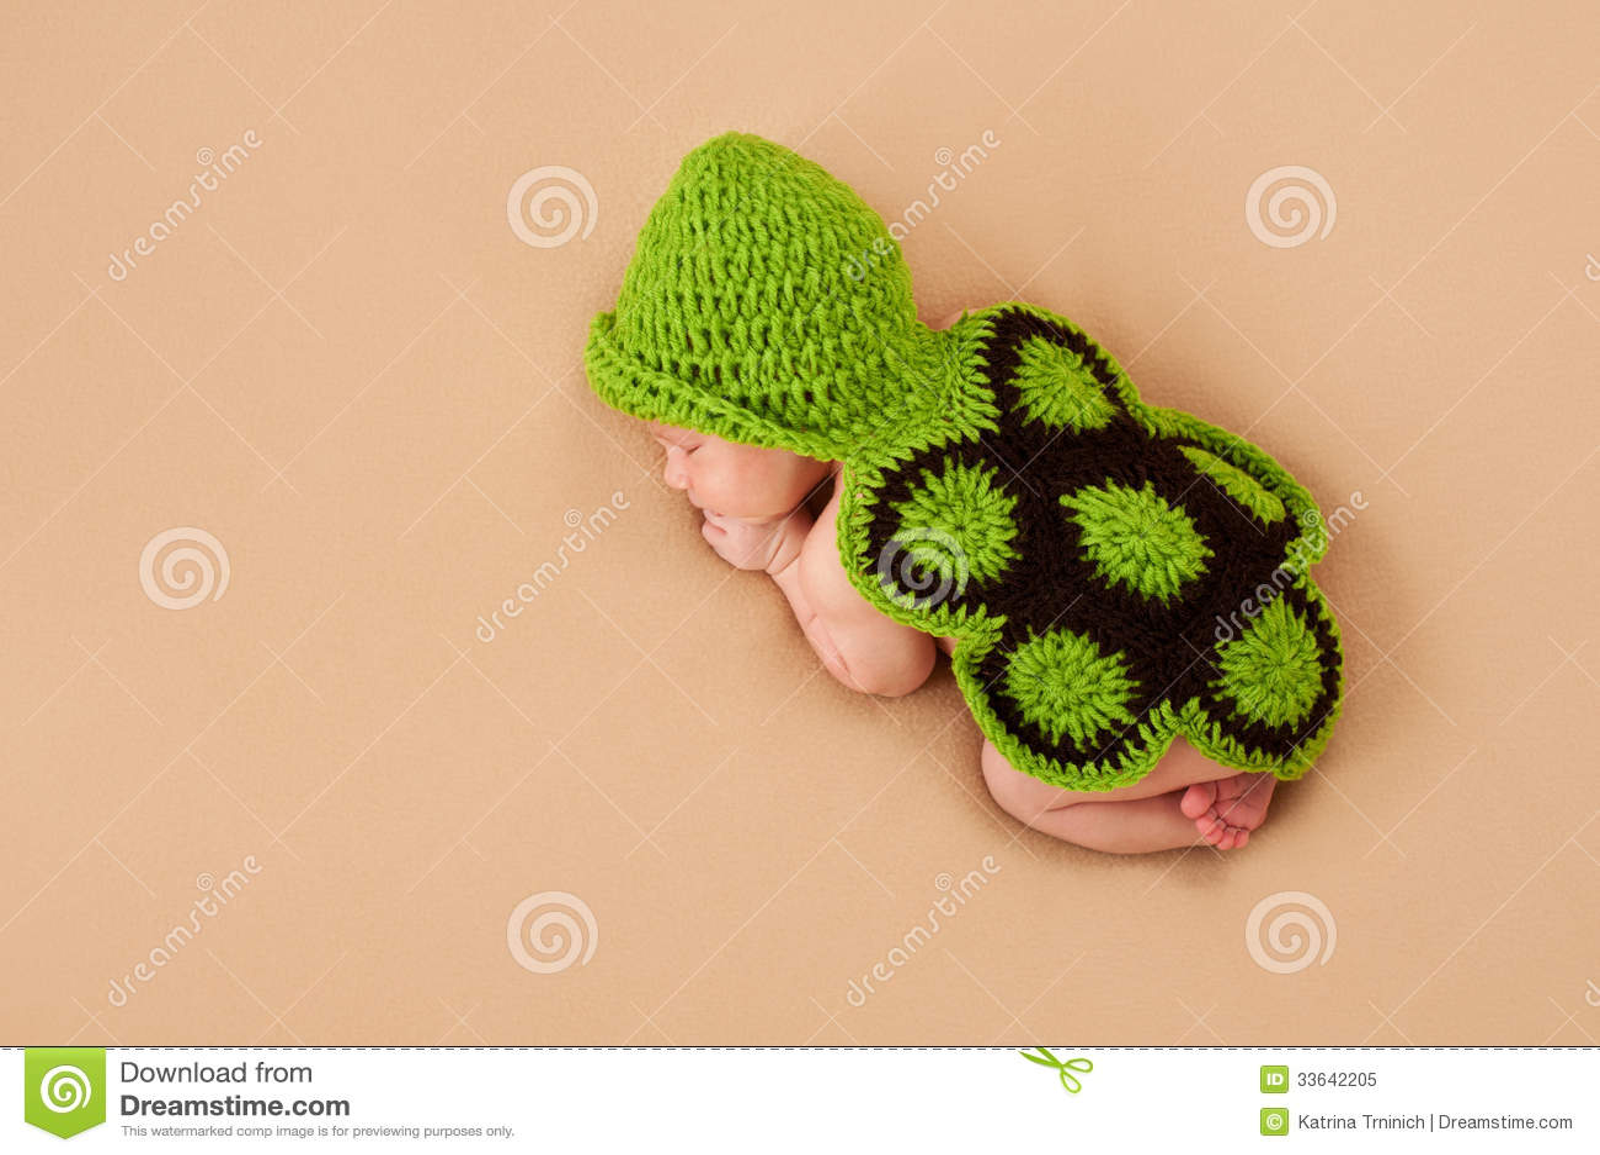 sleeping newborn baby in turtle costume royalty free stock